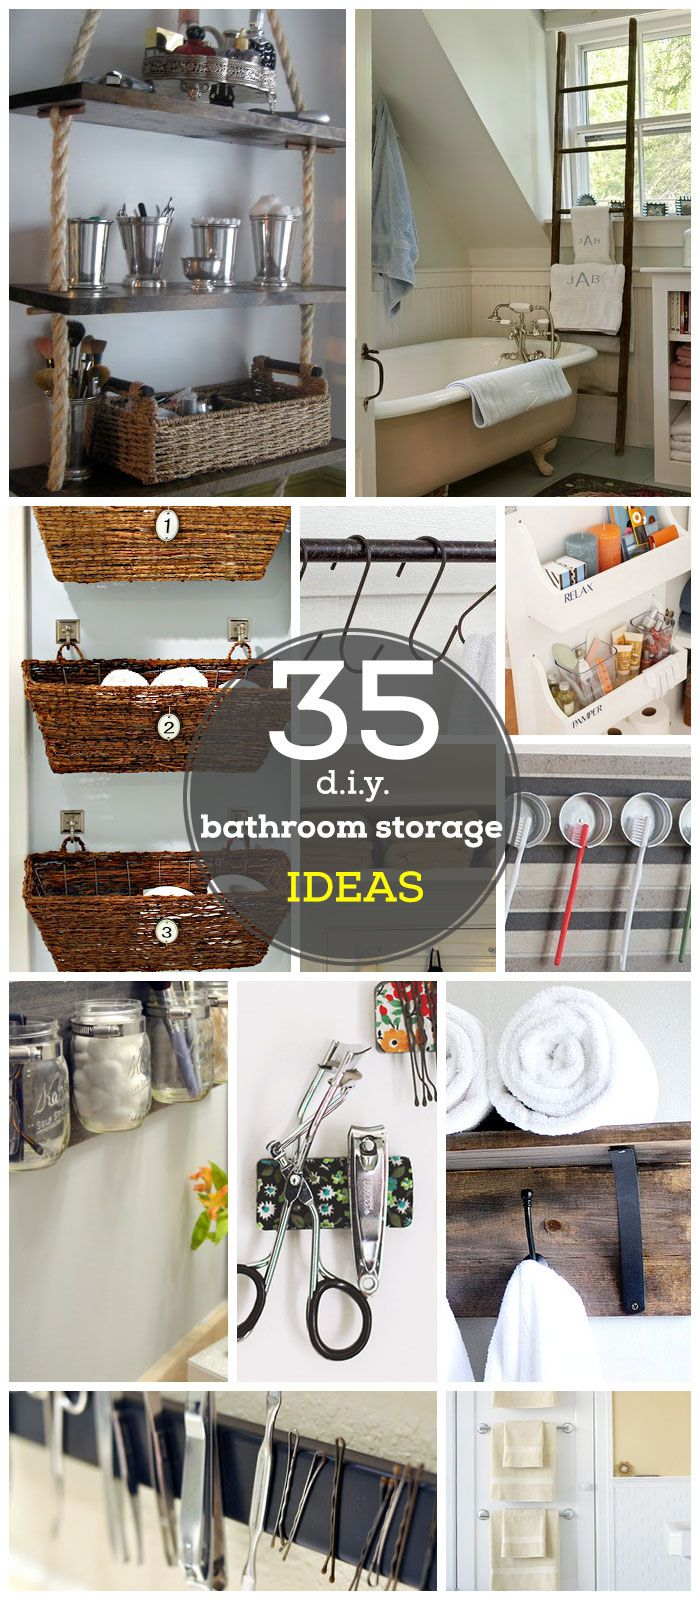 25 Diy Bathroom Storage Ideas For Small Spaces Diy Bathroom Storage Bathroom Organization Diy Diy Bathroom